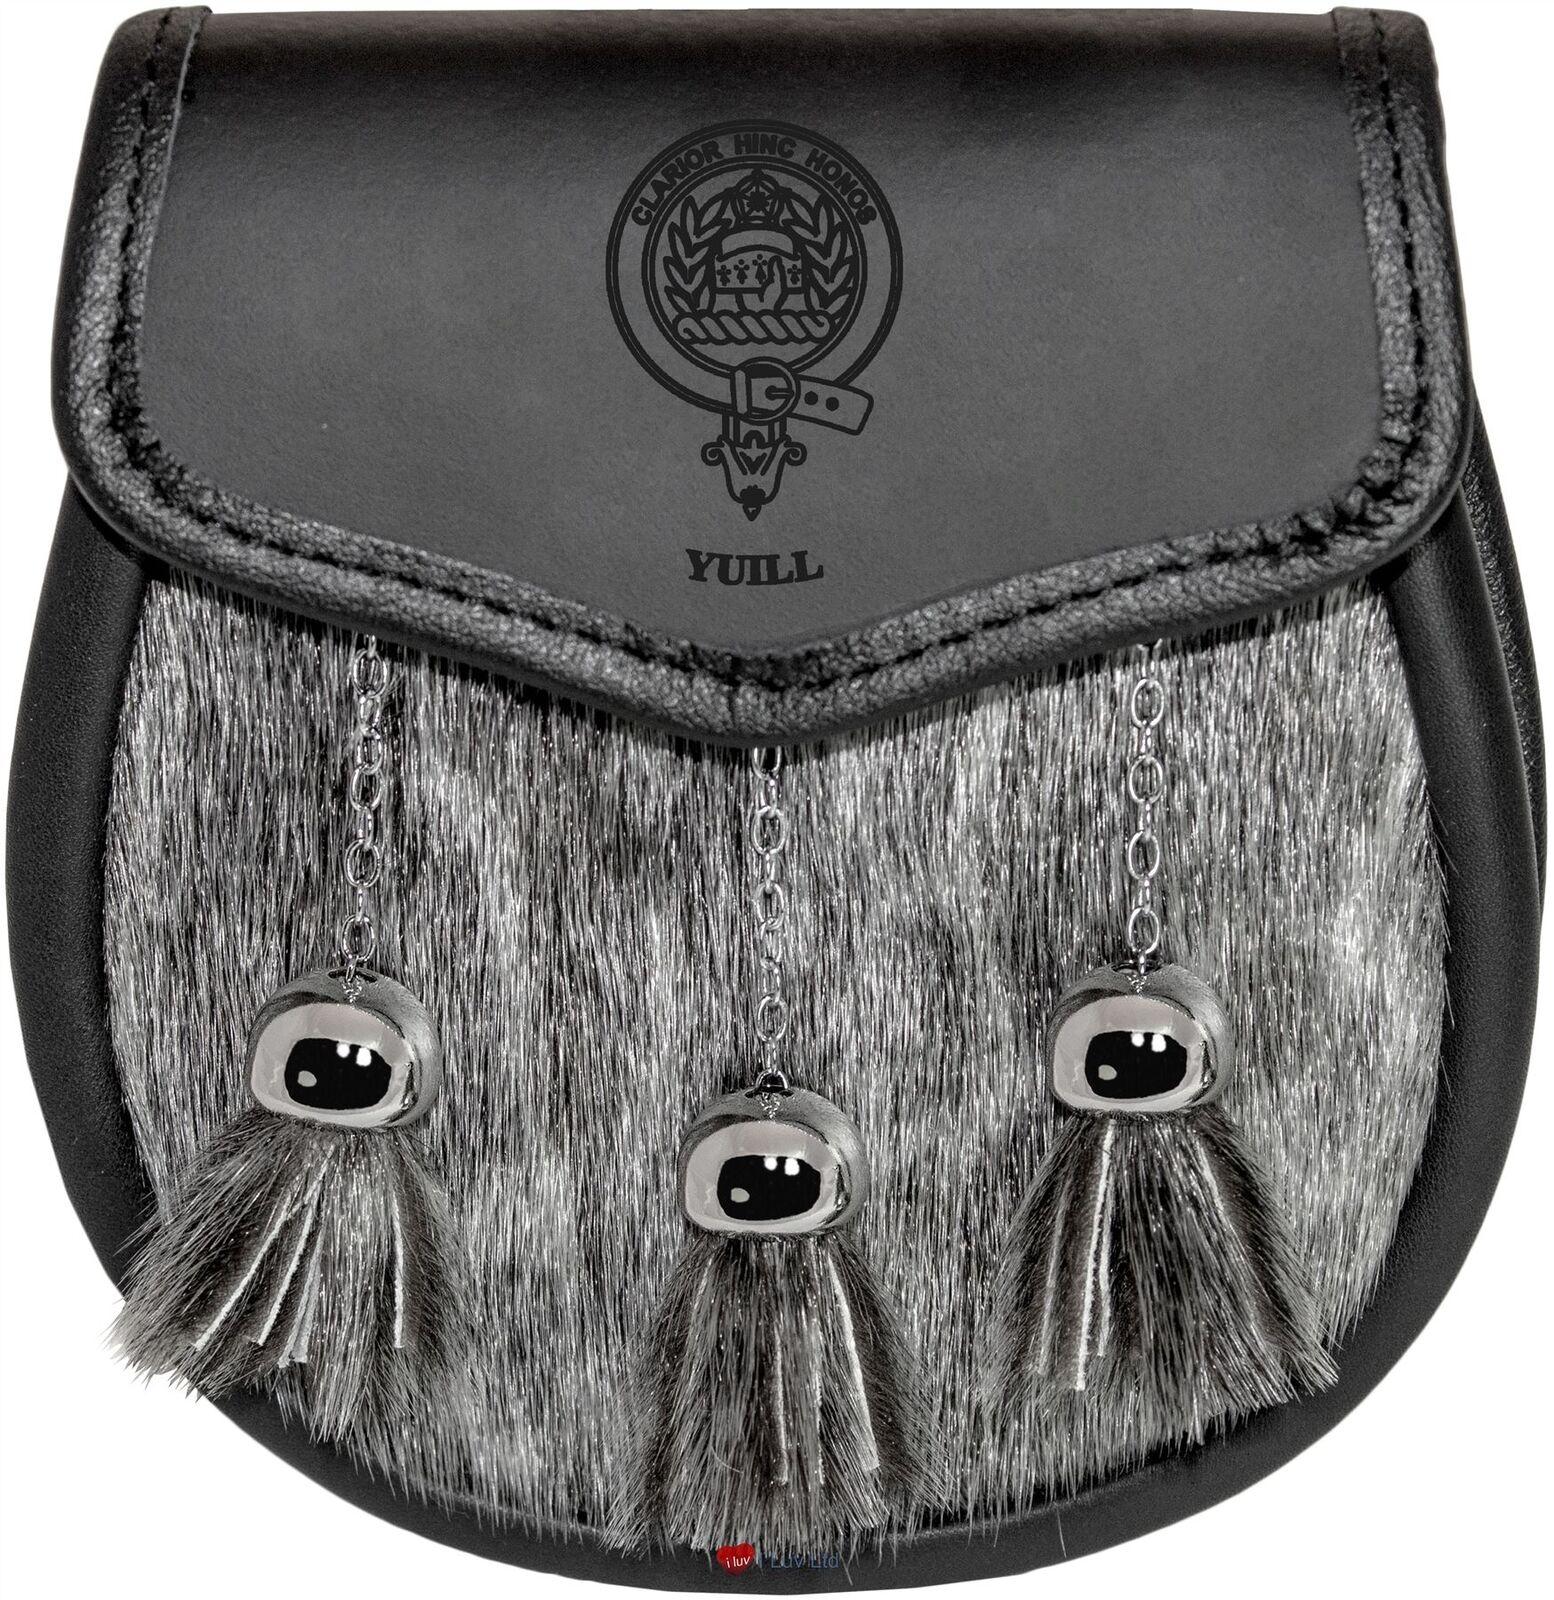 Yuill Semi Dress Sporran Fur Plain Leather Flap Scottish Clan Crest